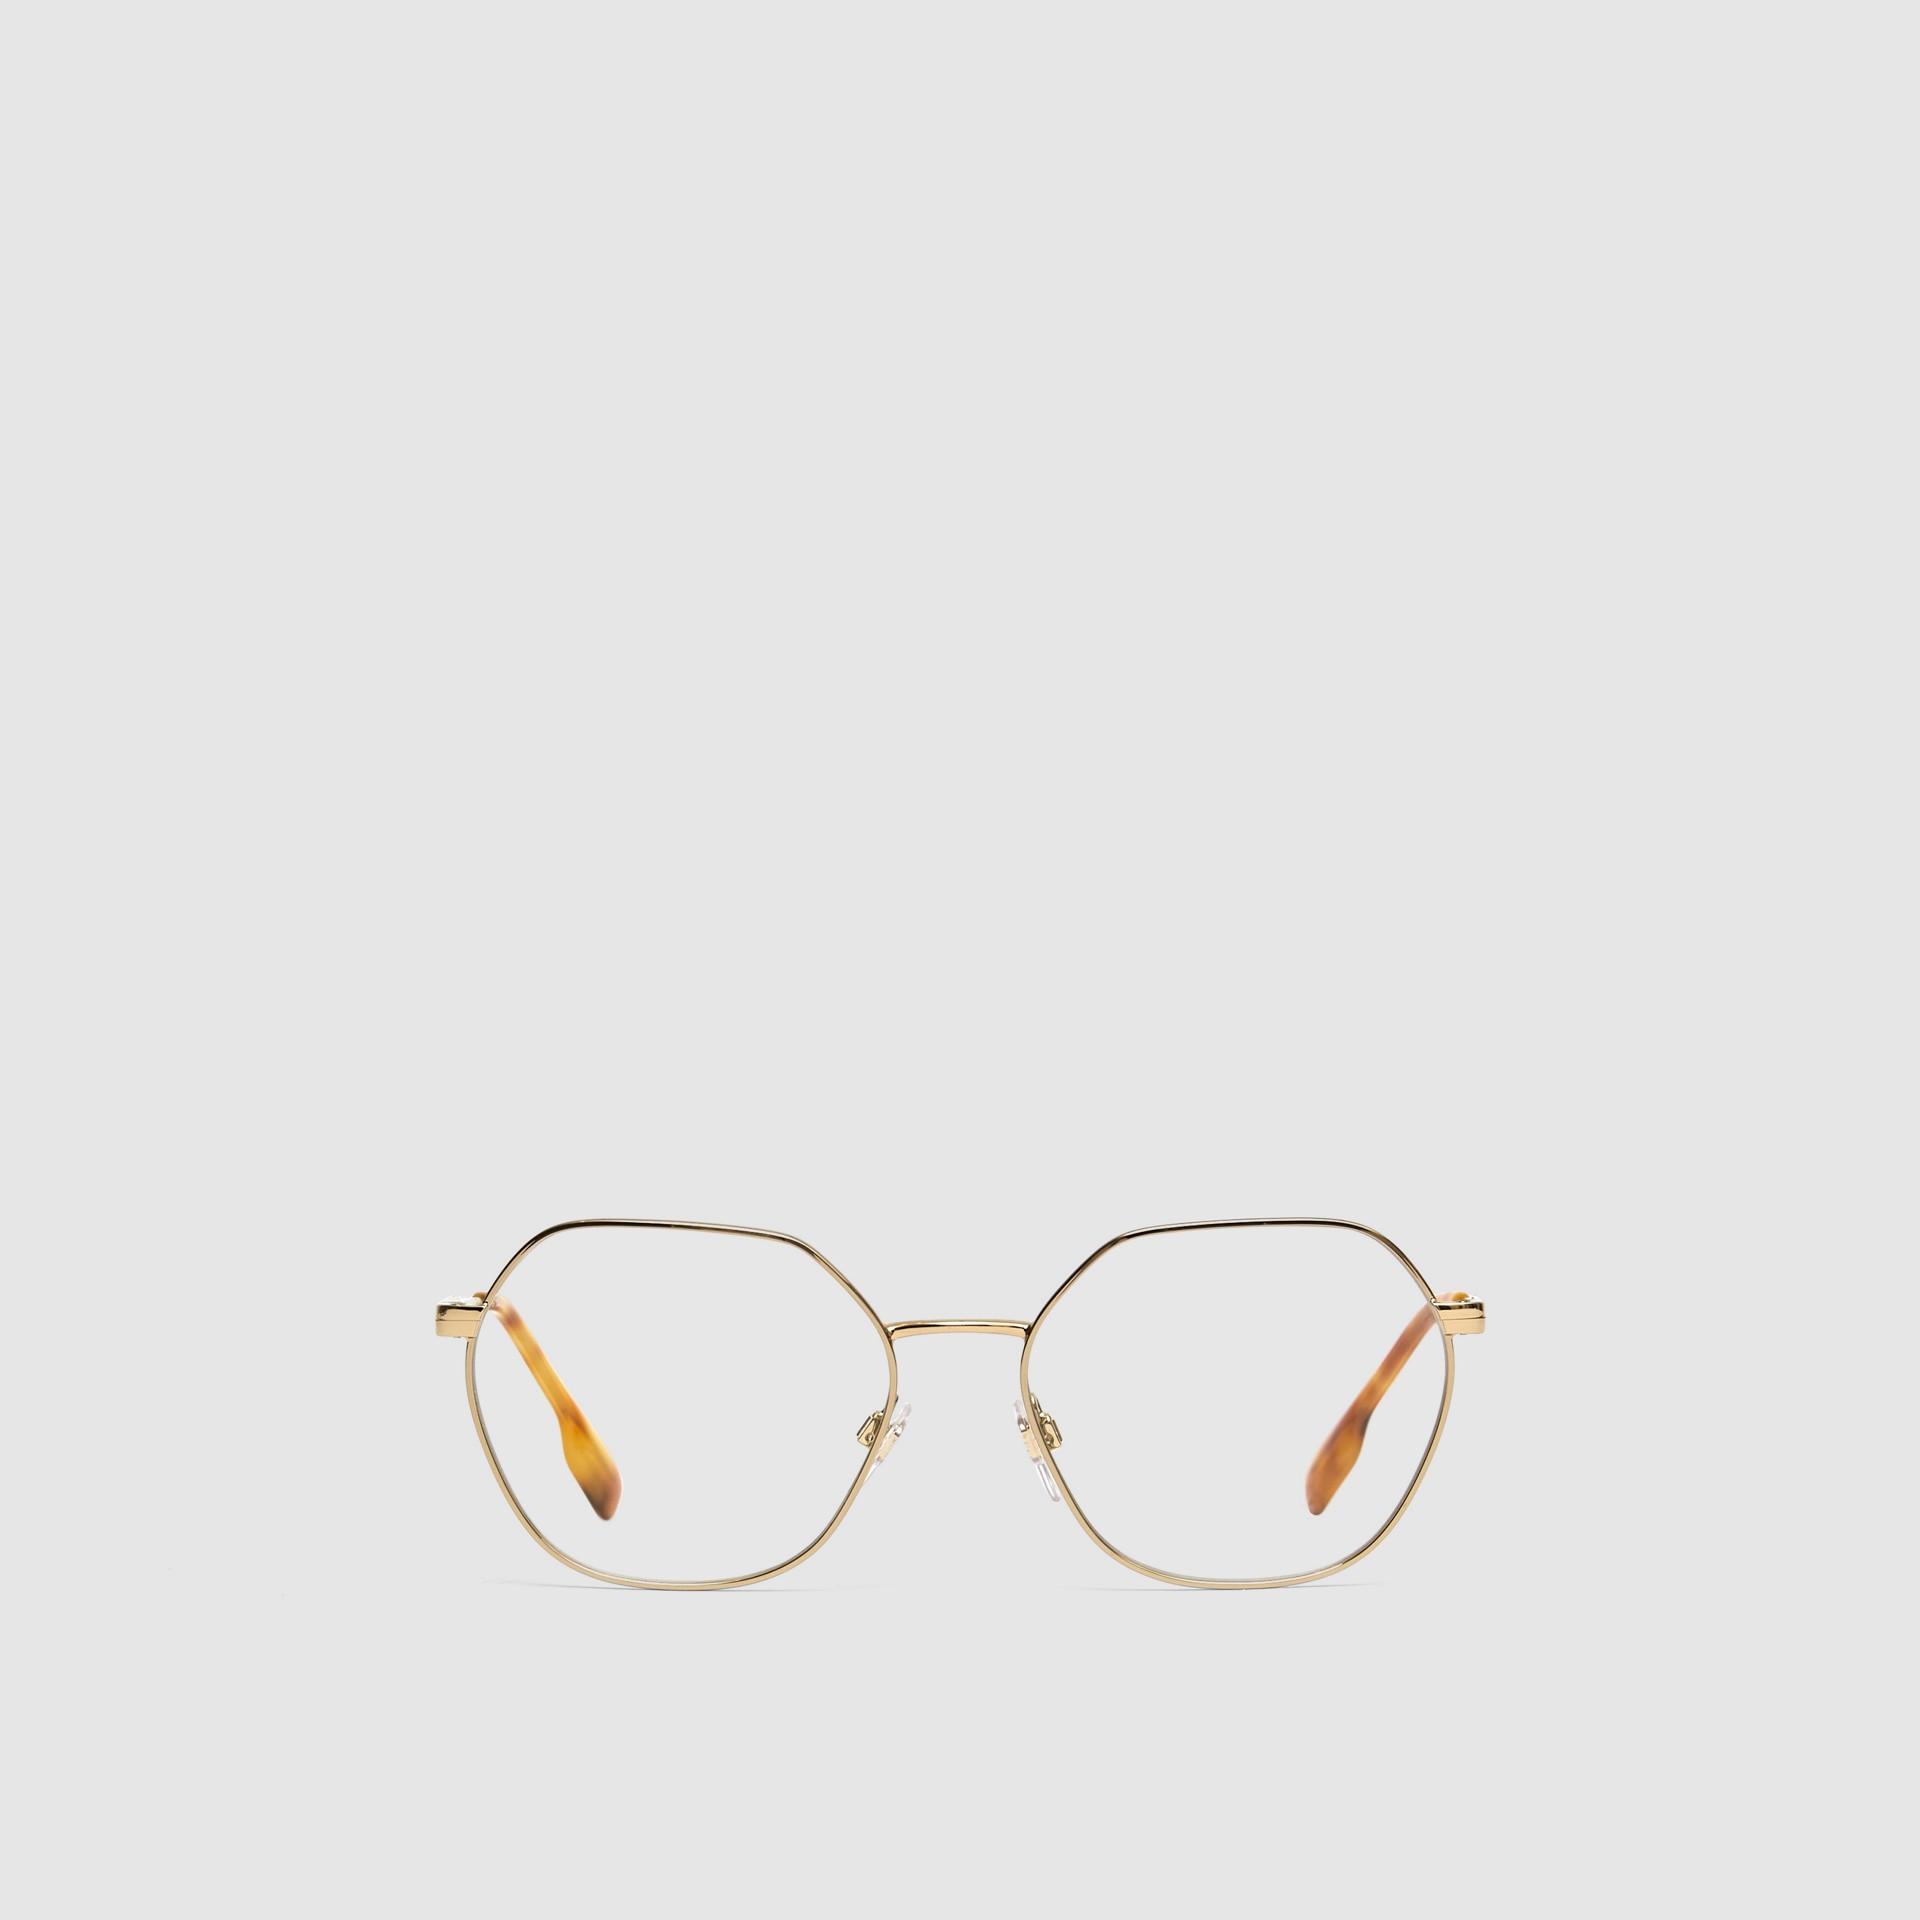 Geometric Optical Frames in Tortoiseshell - Women | Burberry - gallery image 0